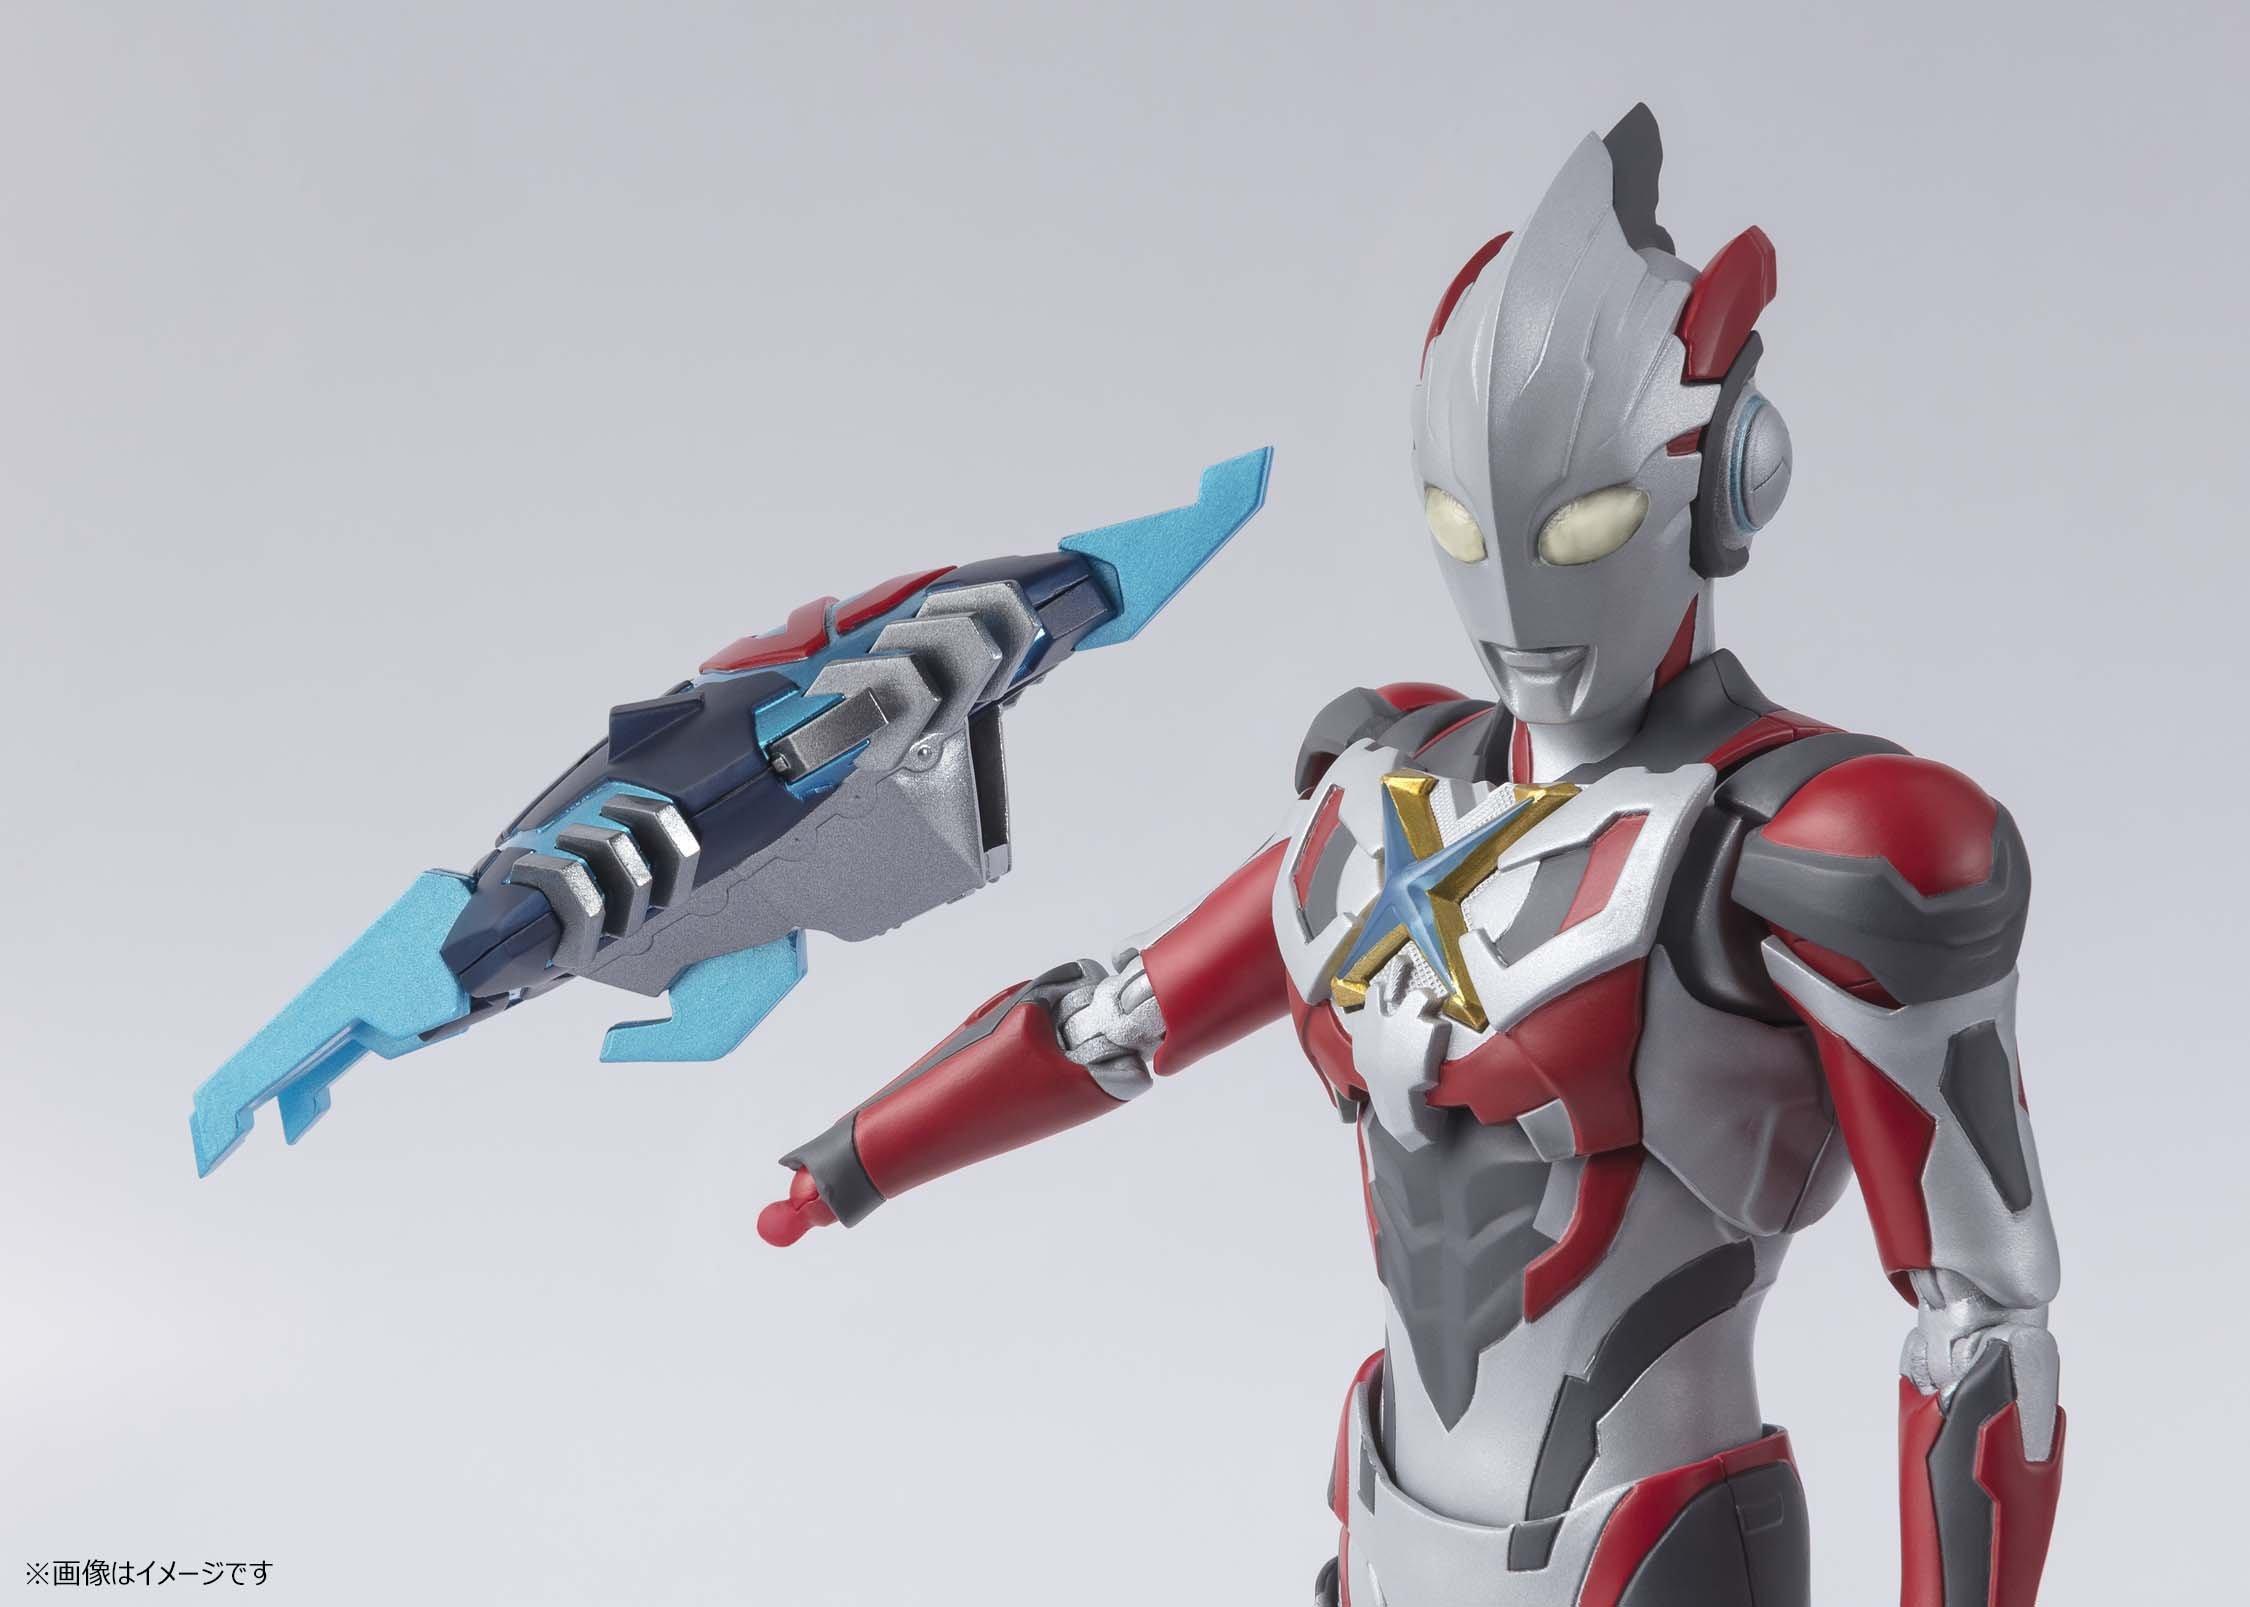 S.H.Figuarts Ultraman Jack approx 150mm ABS PVC Movable Figure Bandai Spirits